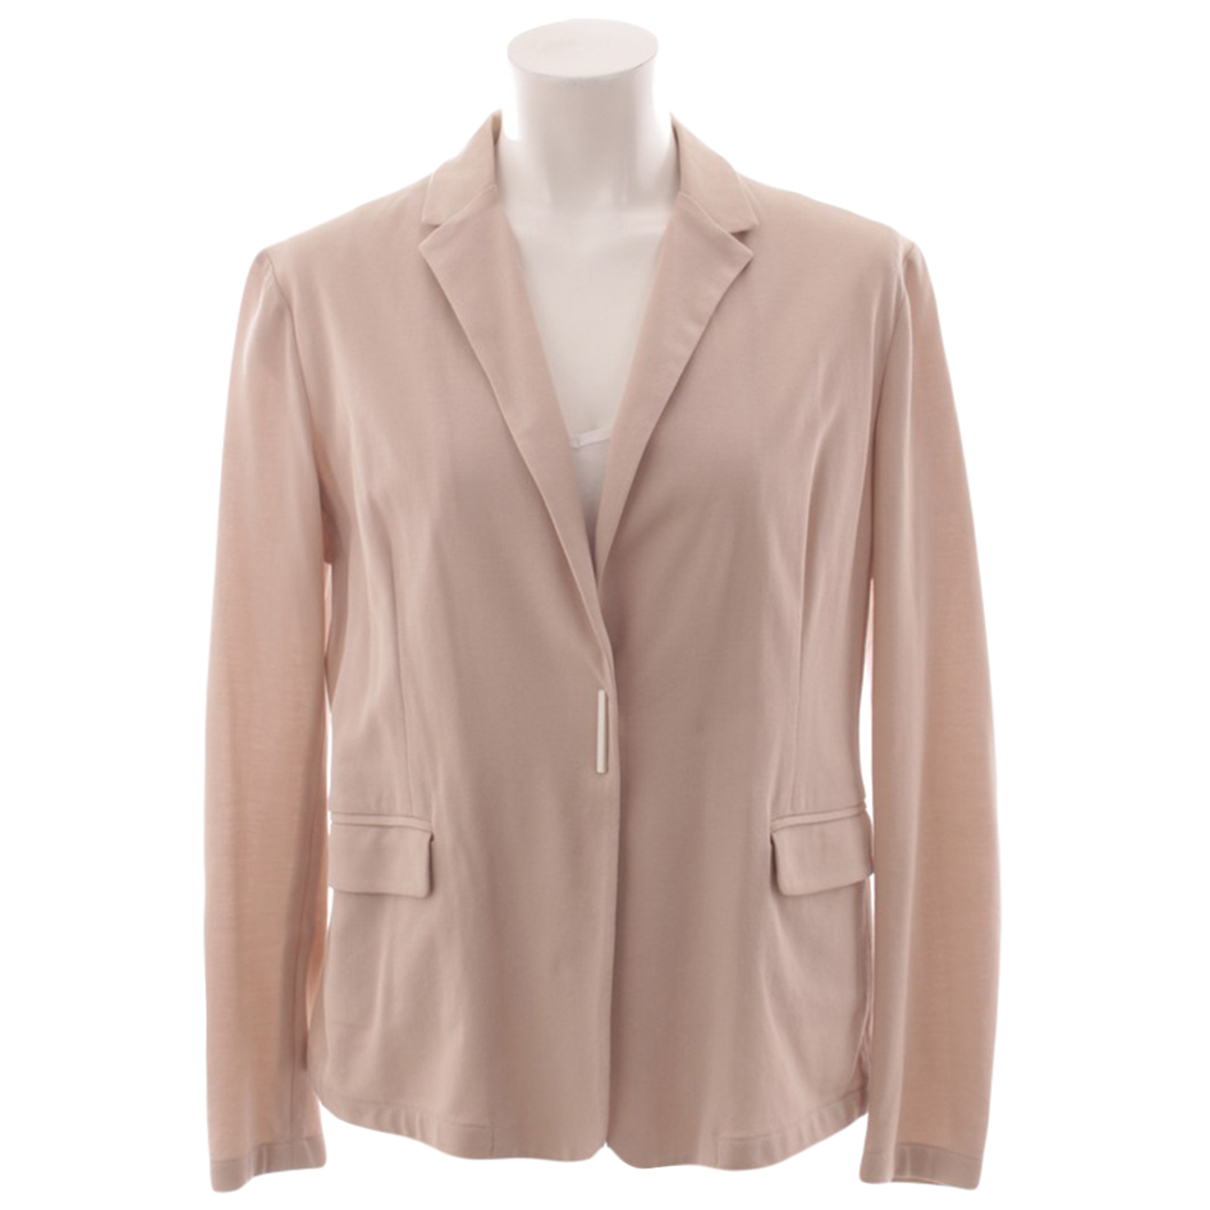 Fabiana Filippi N Brown Cotton jacket for Women 42 IT